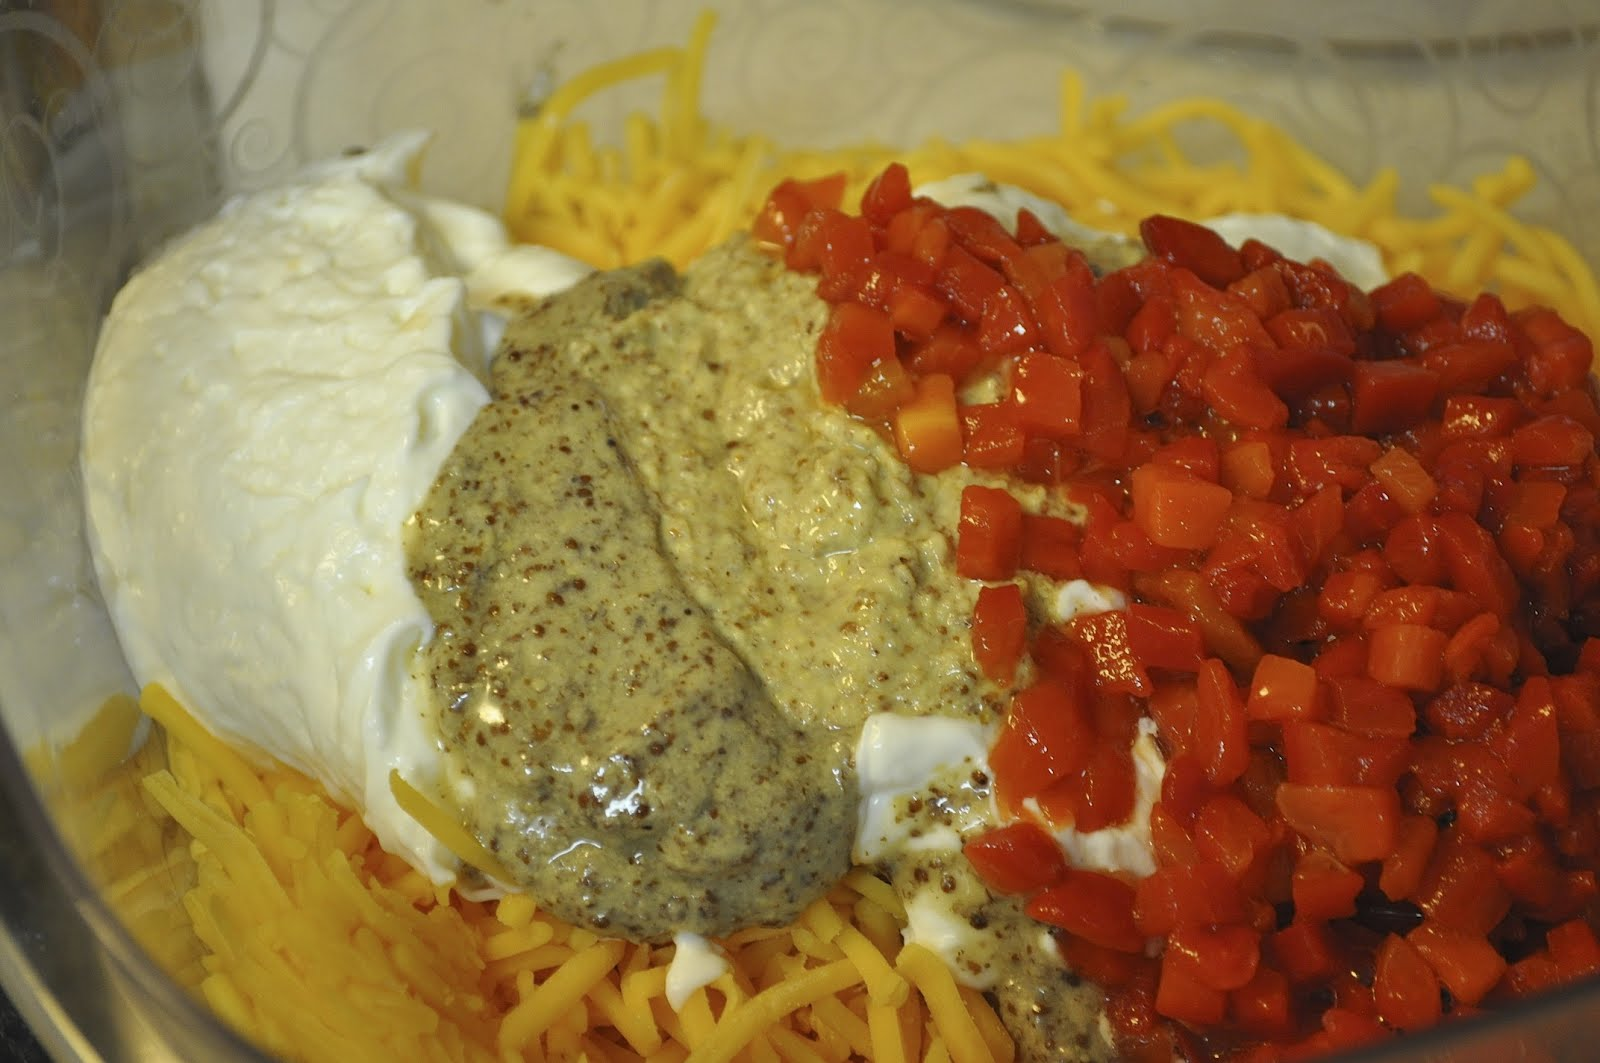 Warm Pimento Cheese And Chips Recipe — Dishmaps